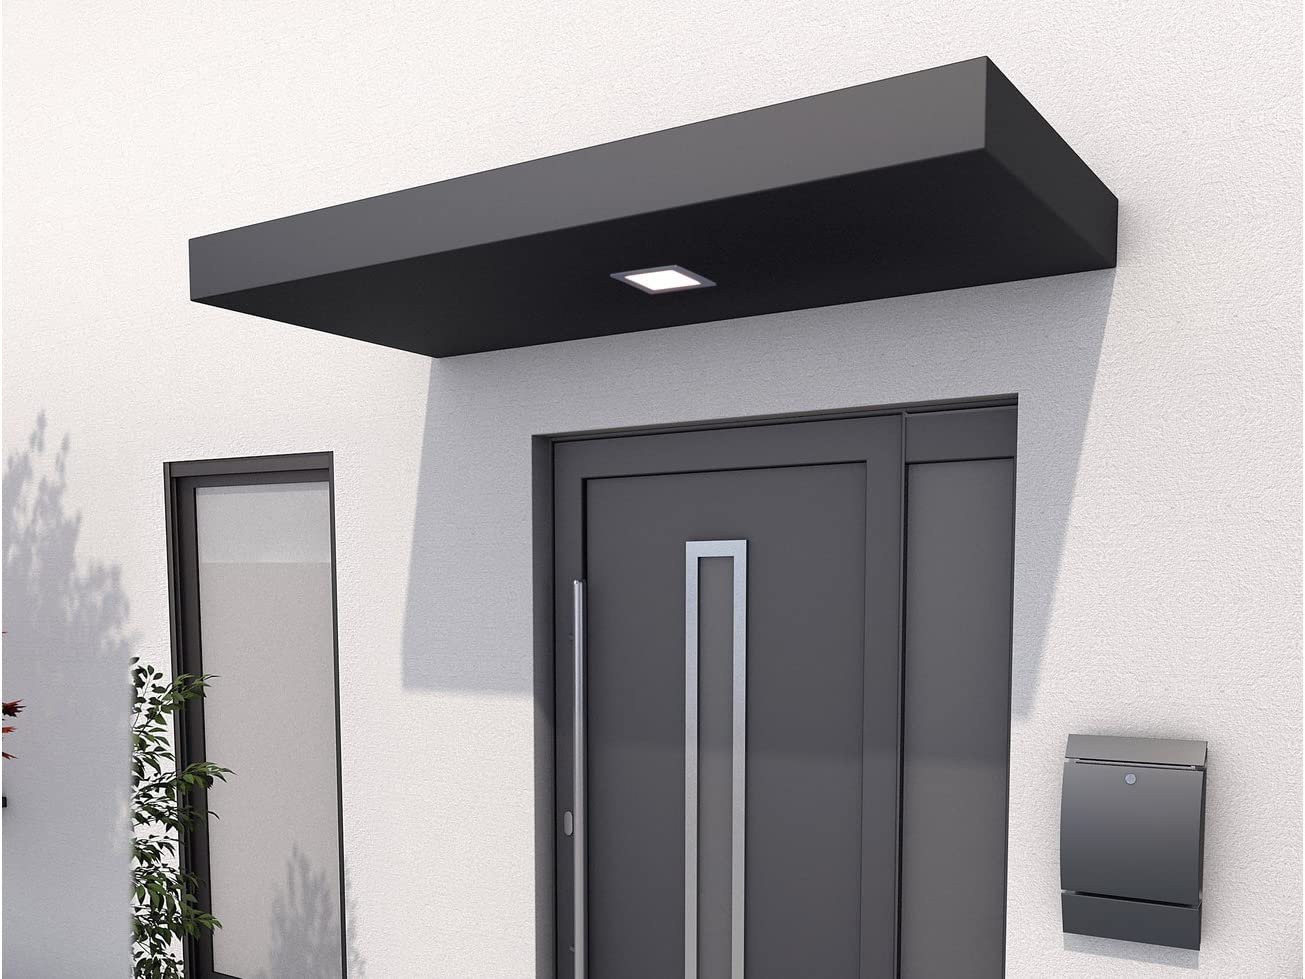 Aluminium anthrazit BxT GUTTA Rechteckvordach BS 160 160x90 cm 160 cm